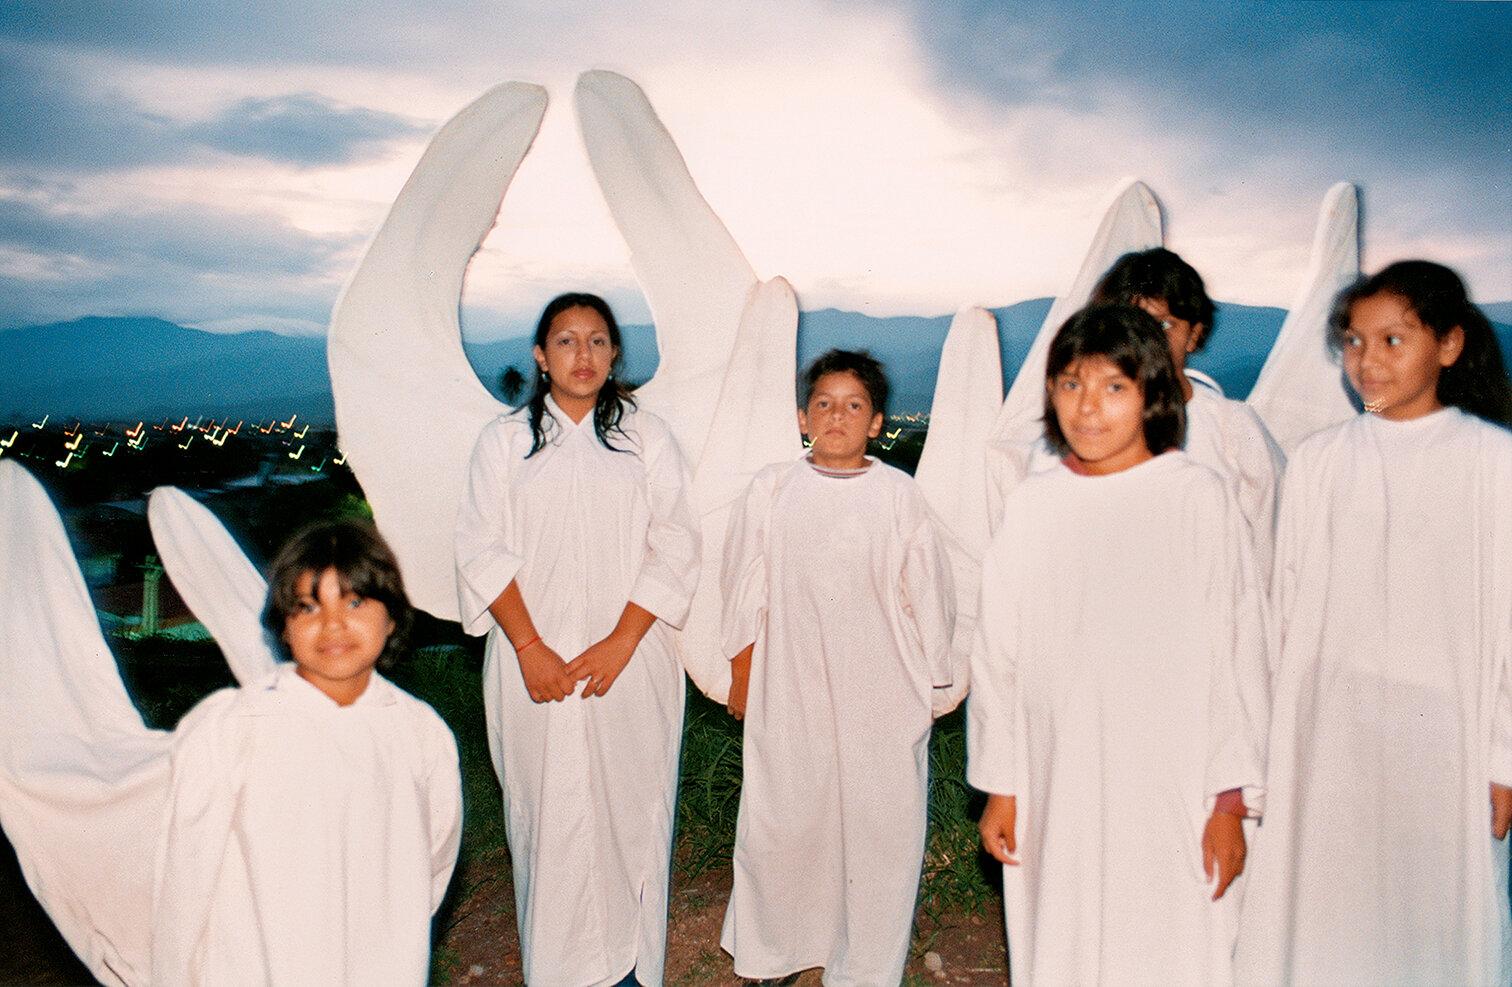 39 Angeles-Angels 2001.jpg